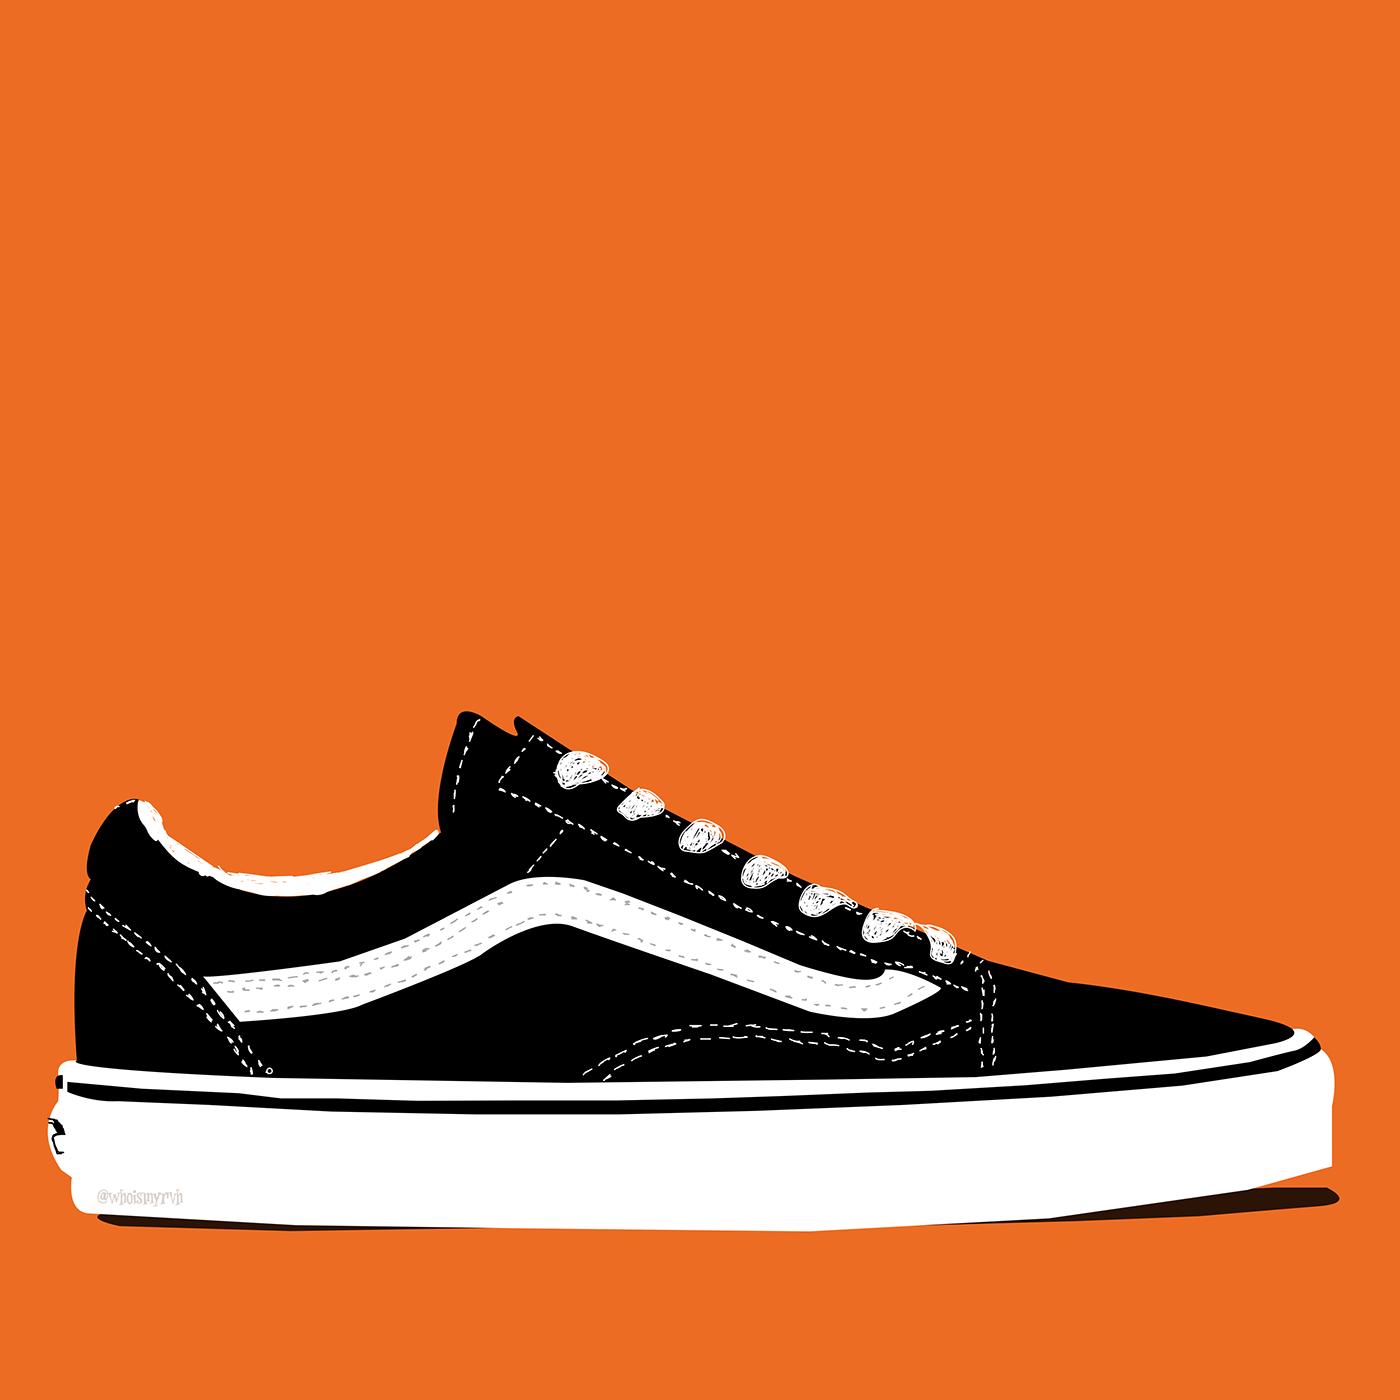 adidas,converse,highfashion,hypebeast,Minimalism,Nike,philadelphia,sneaker,Vans,vectorart